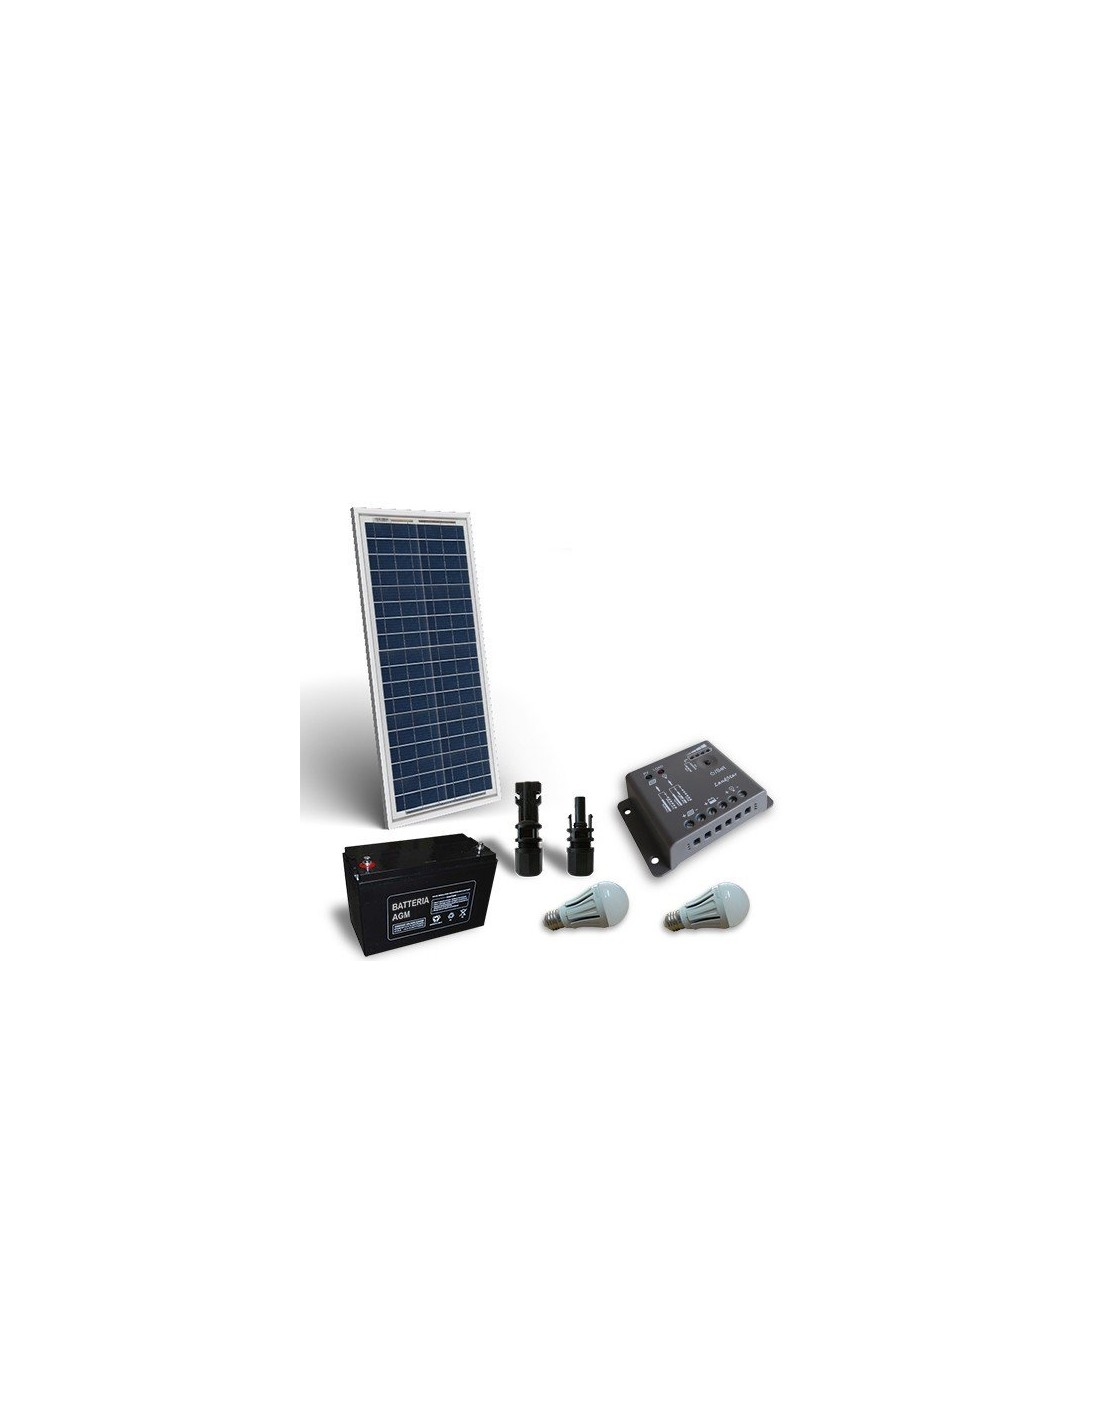 Kit solare illuminazione led 30w 12v per interni fotovoltaico for Illuminazione per interni a led